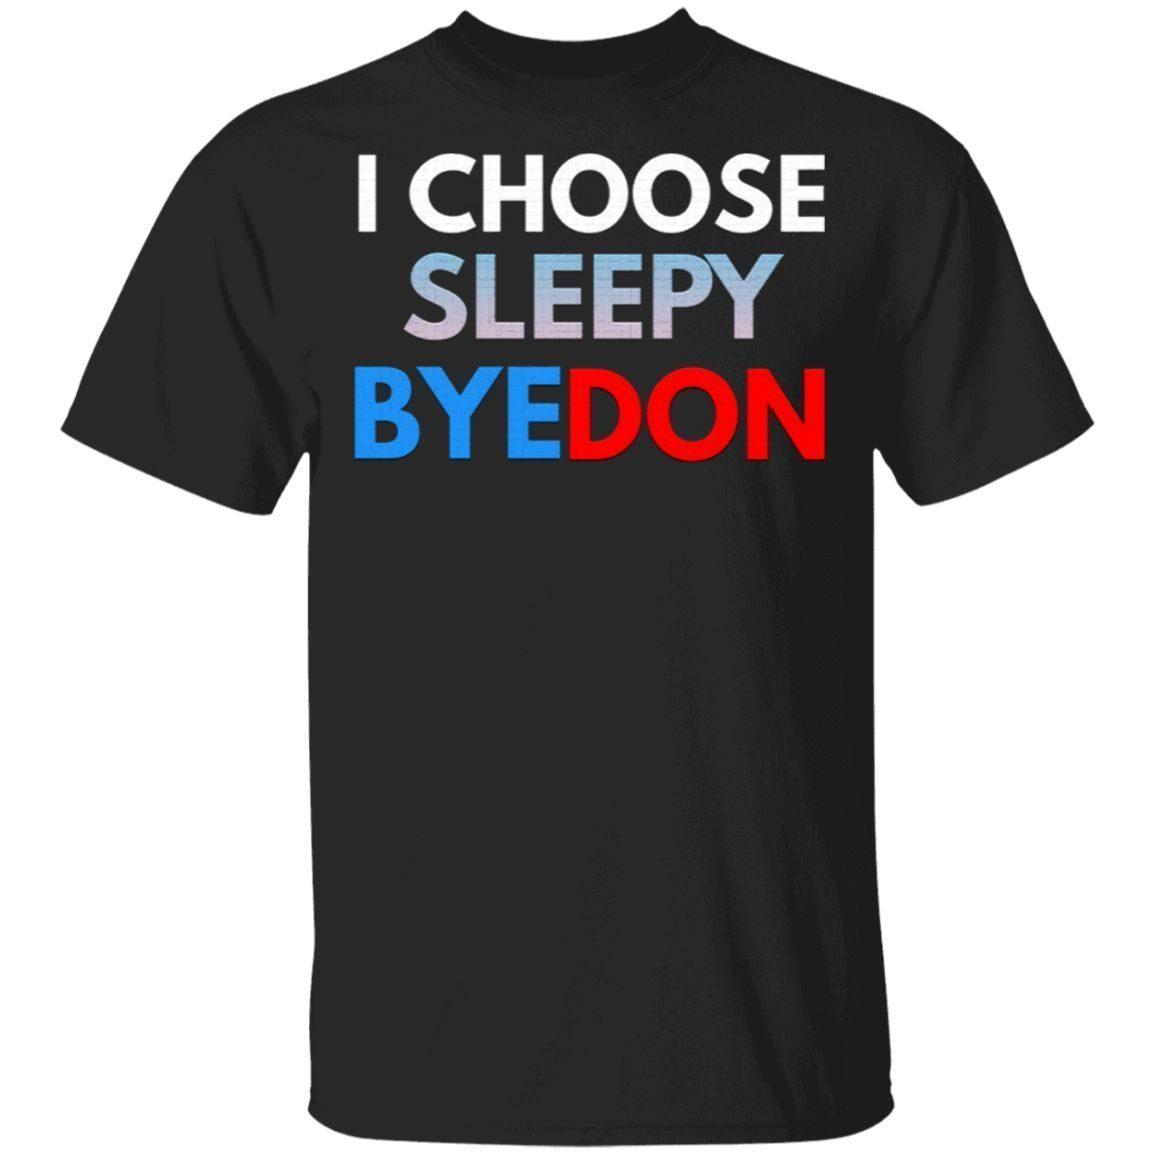 I choose sleepy byedon T-Shirt